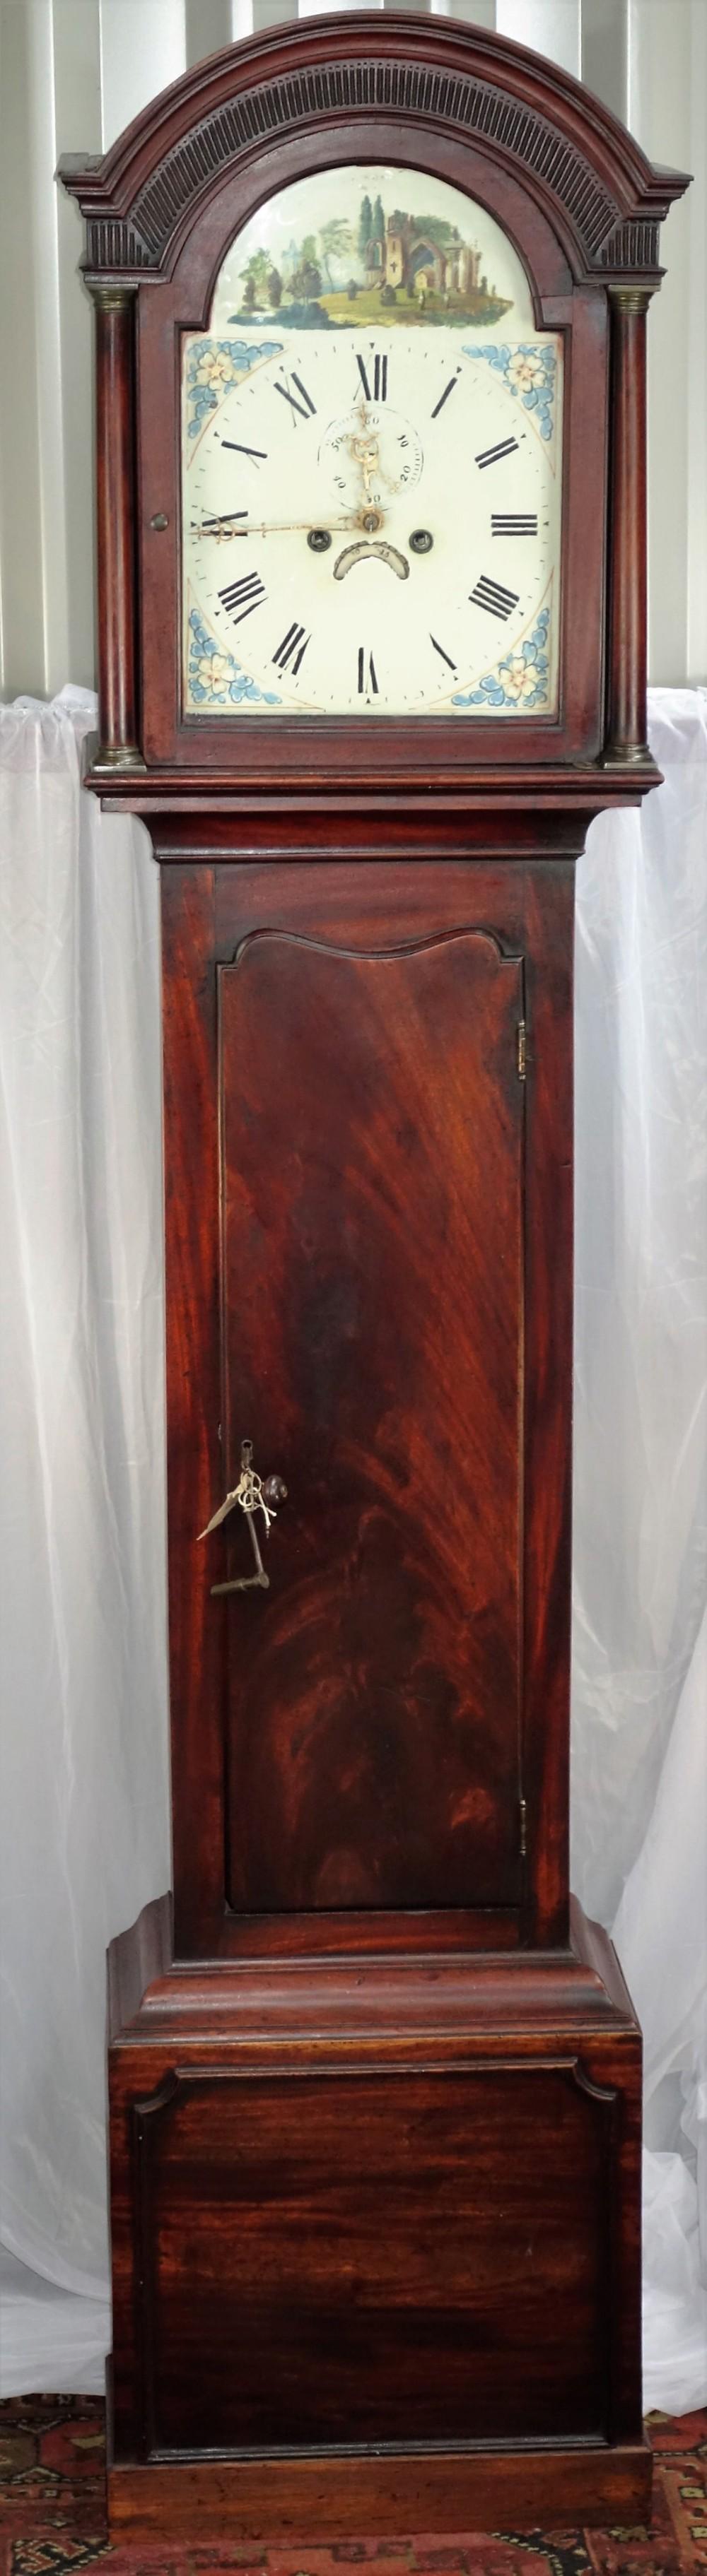 georgian george iii mahogany cased grandfather or longcase long case clock